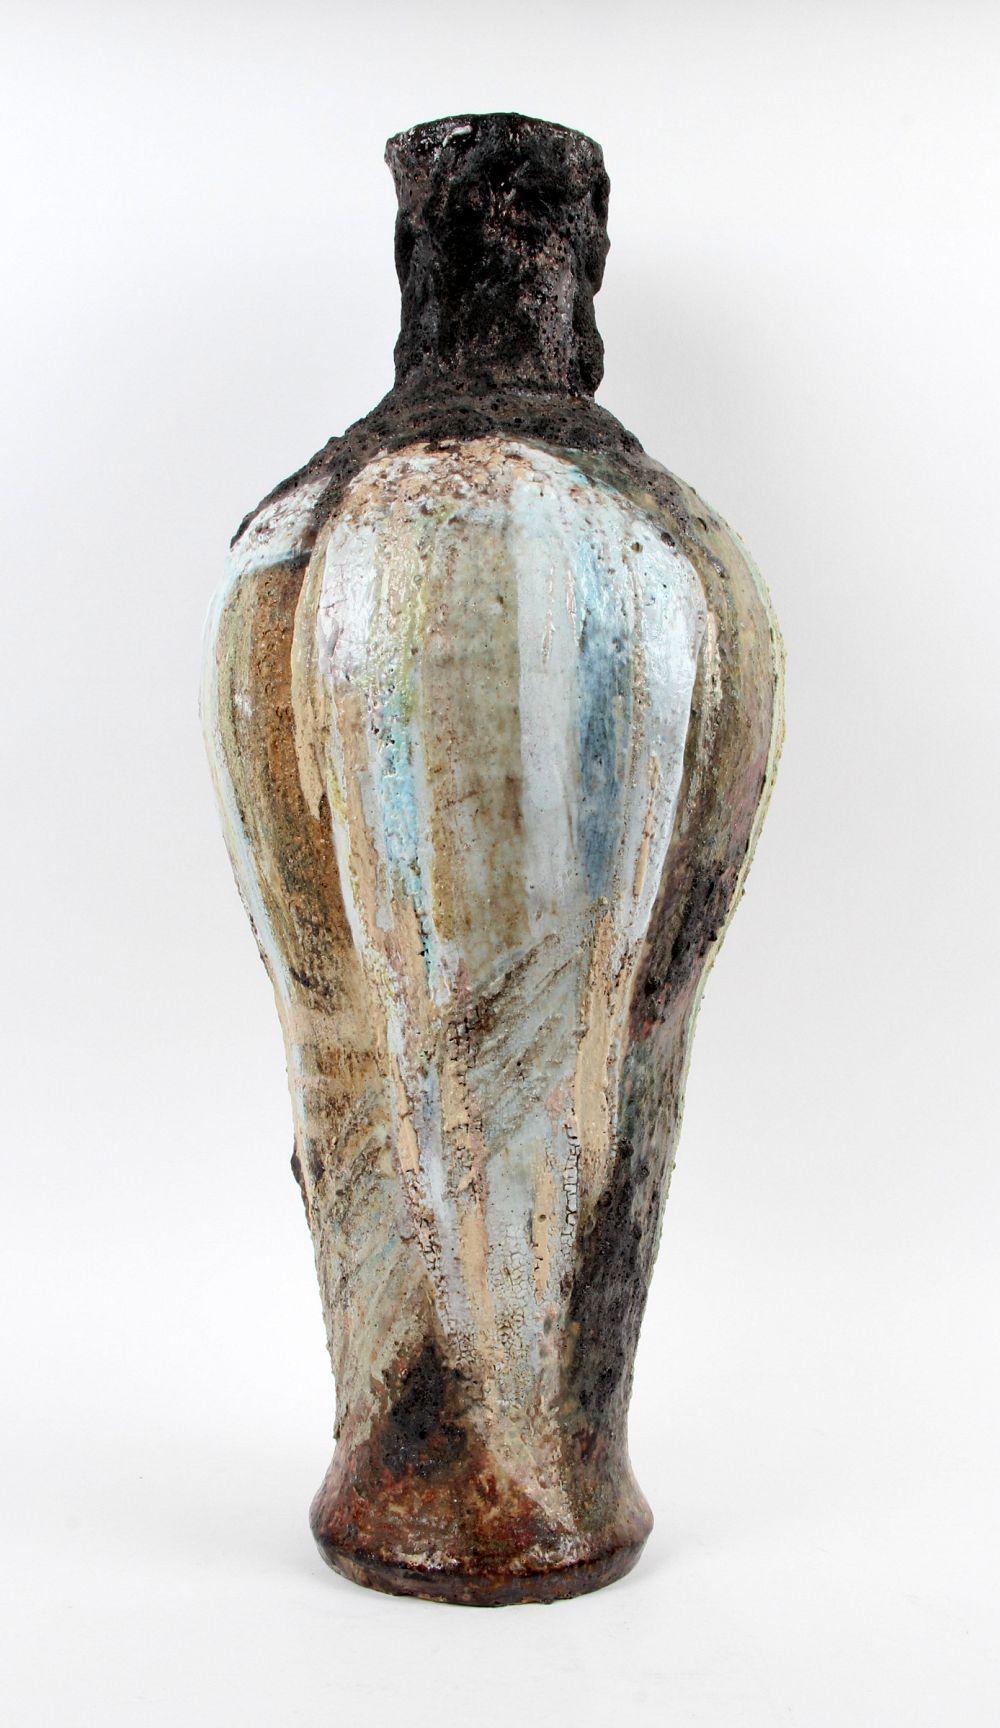 James miles robert j washington 1913 97 large studio pottery james miles robert j washington 1913 97 large studio pottery vase 1250 reviewsmspy